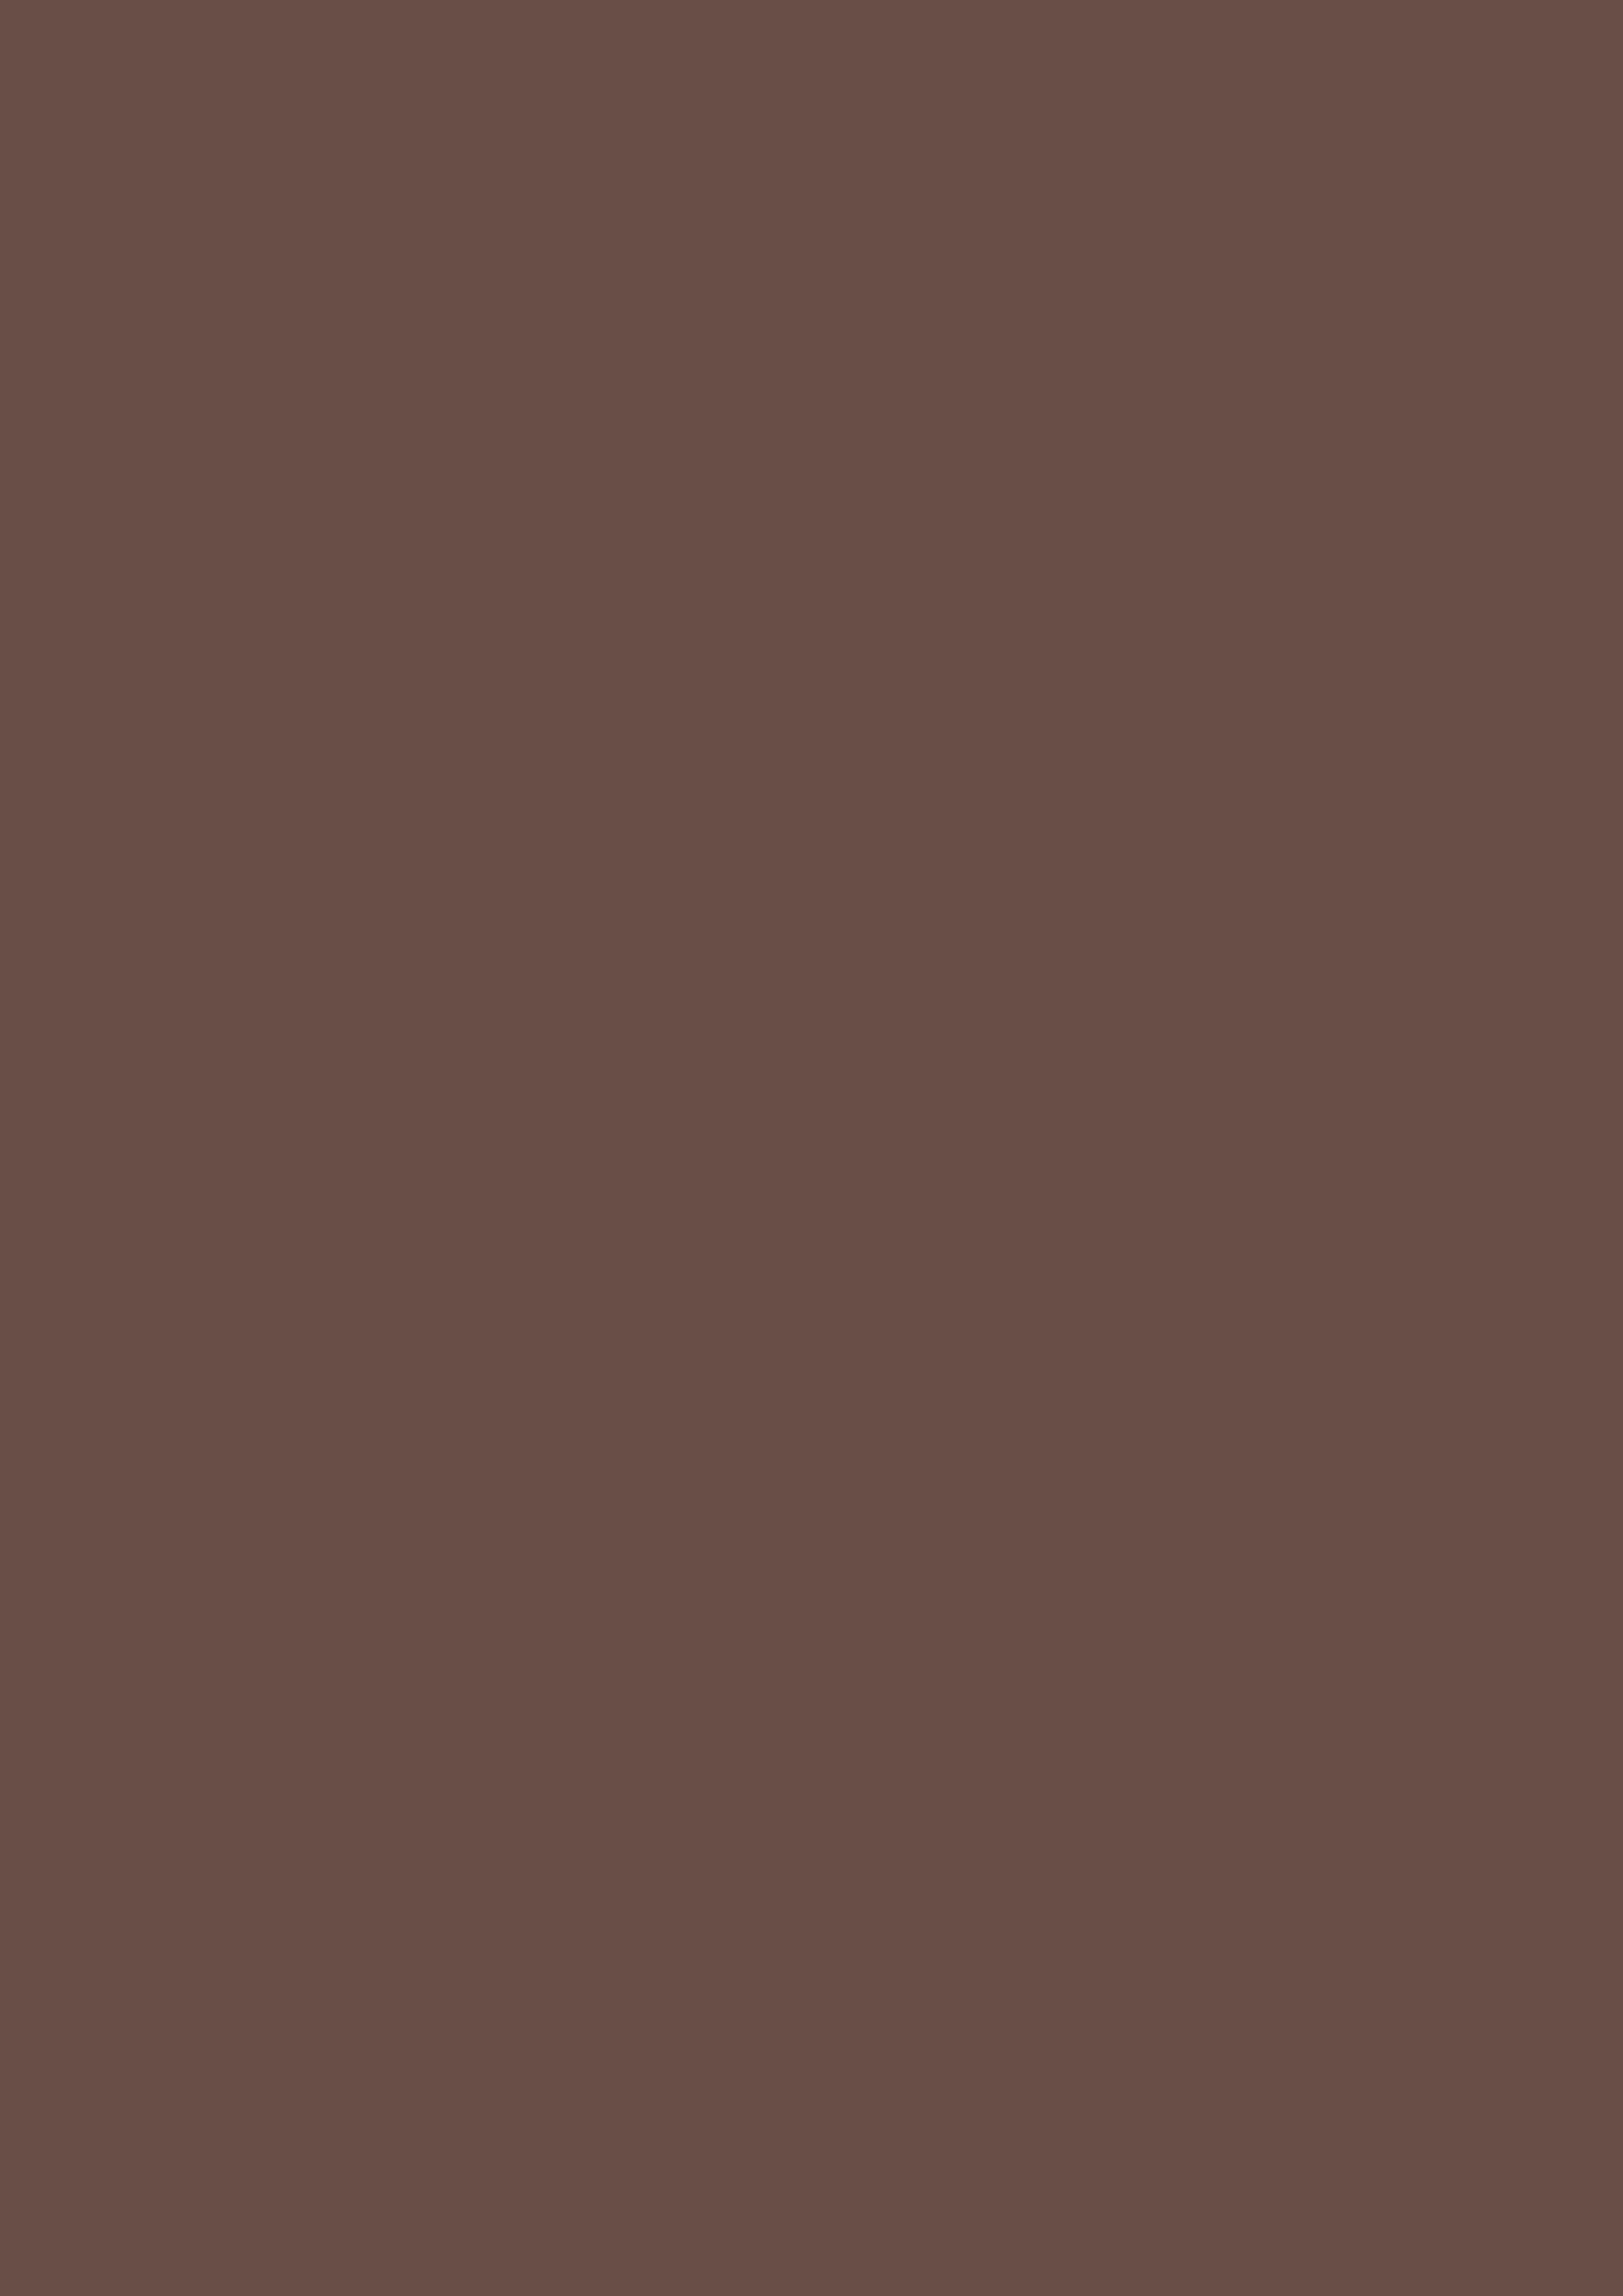 2480x3508 Liver Solid Color Background